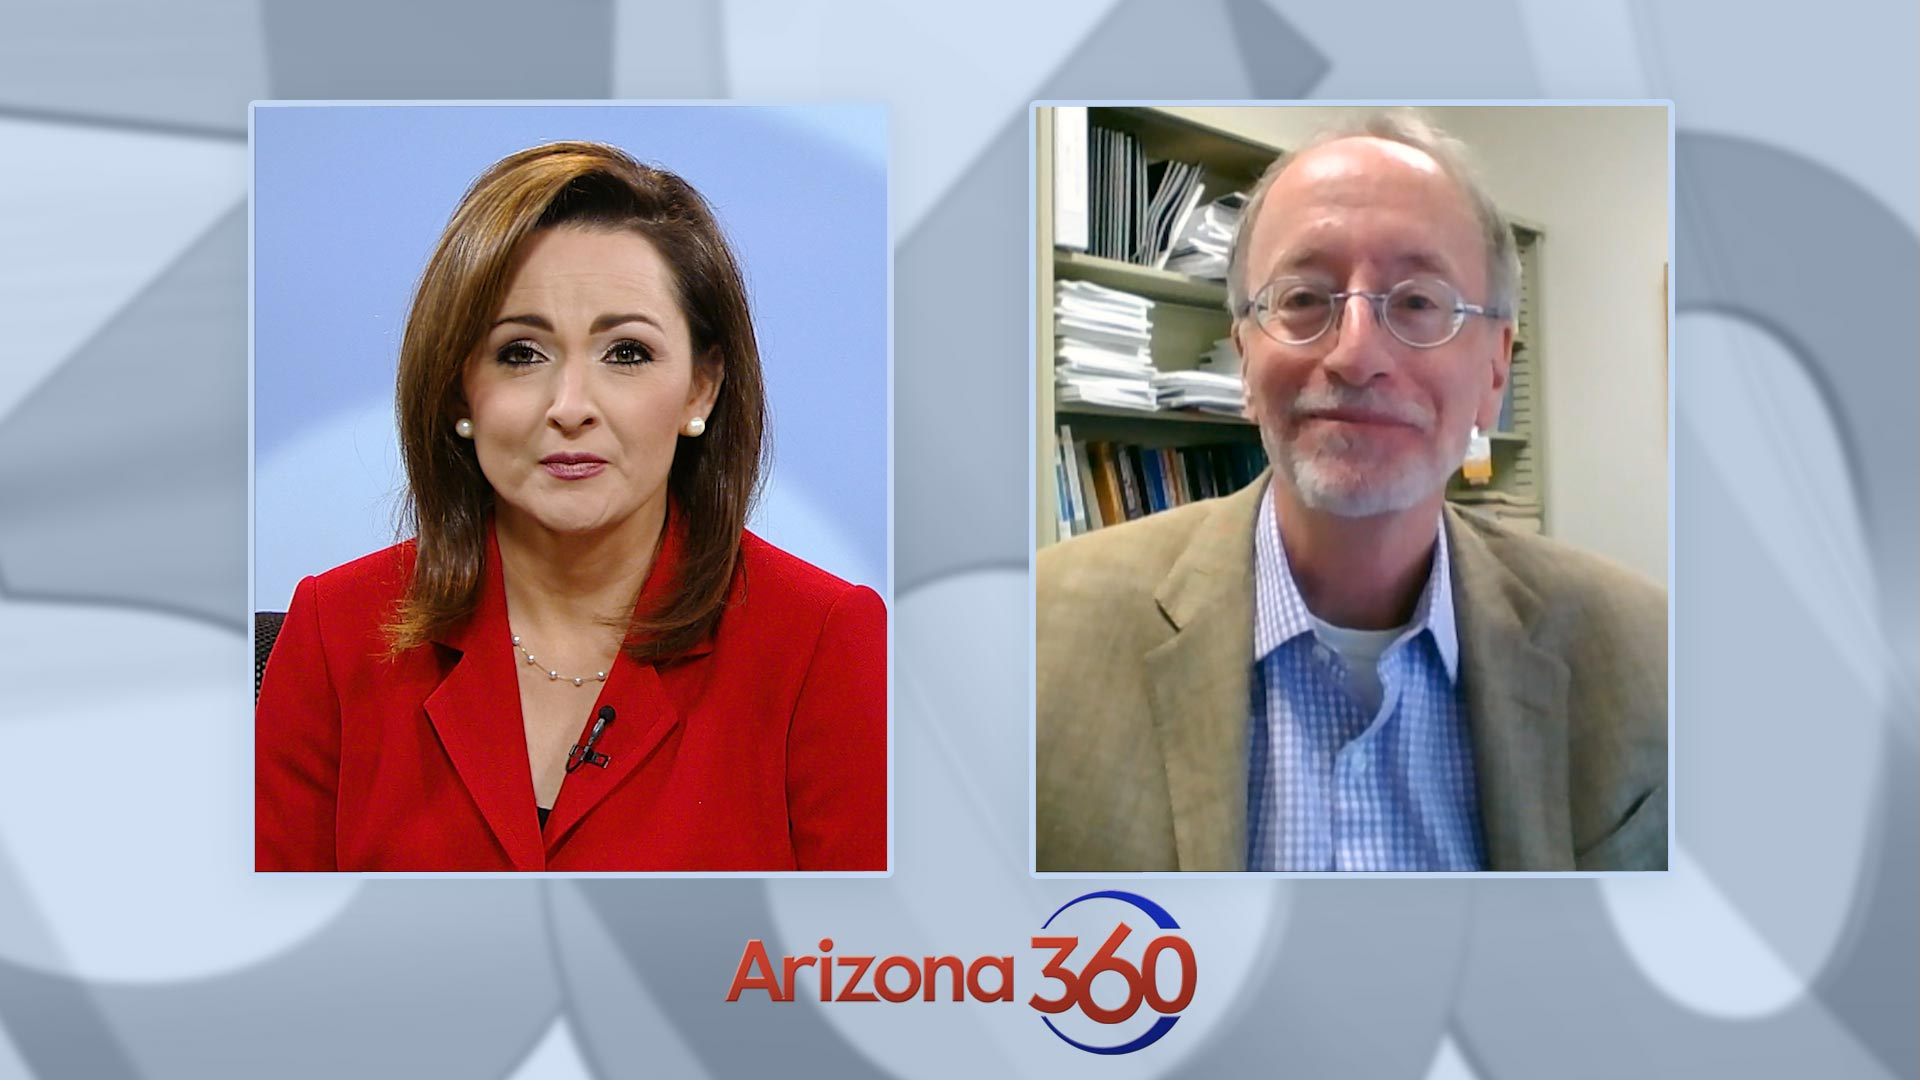 University of Arizona economist George Hammond during an interview with Arizona 360 host Lorraine Rivera on Dec. 2, 2020